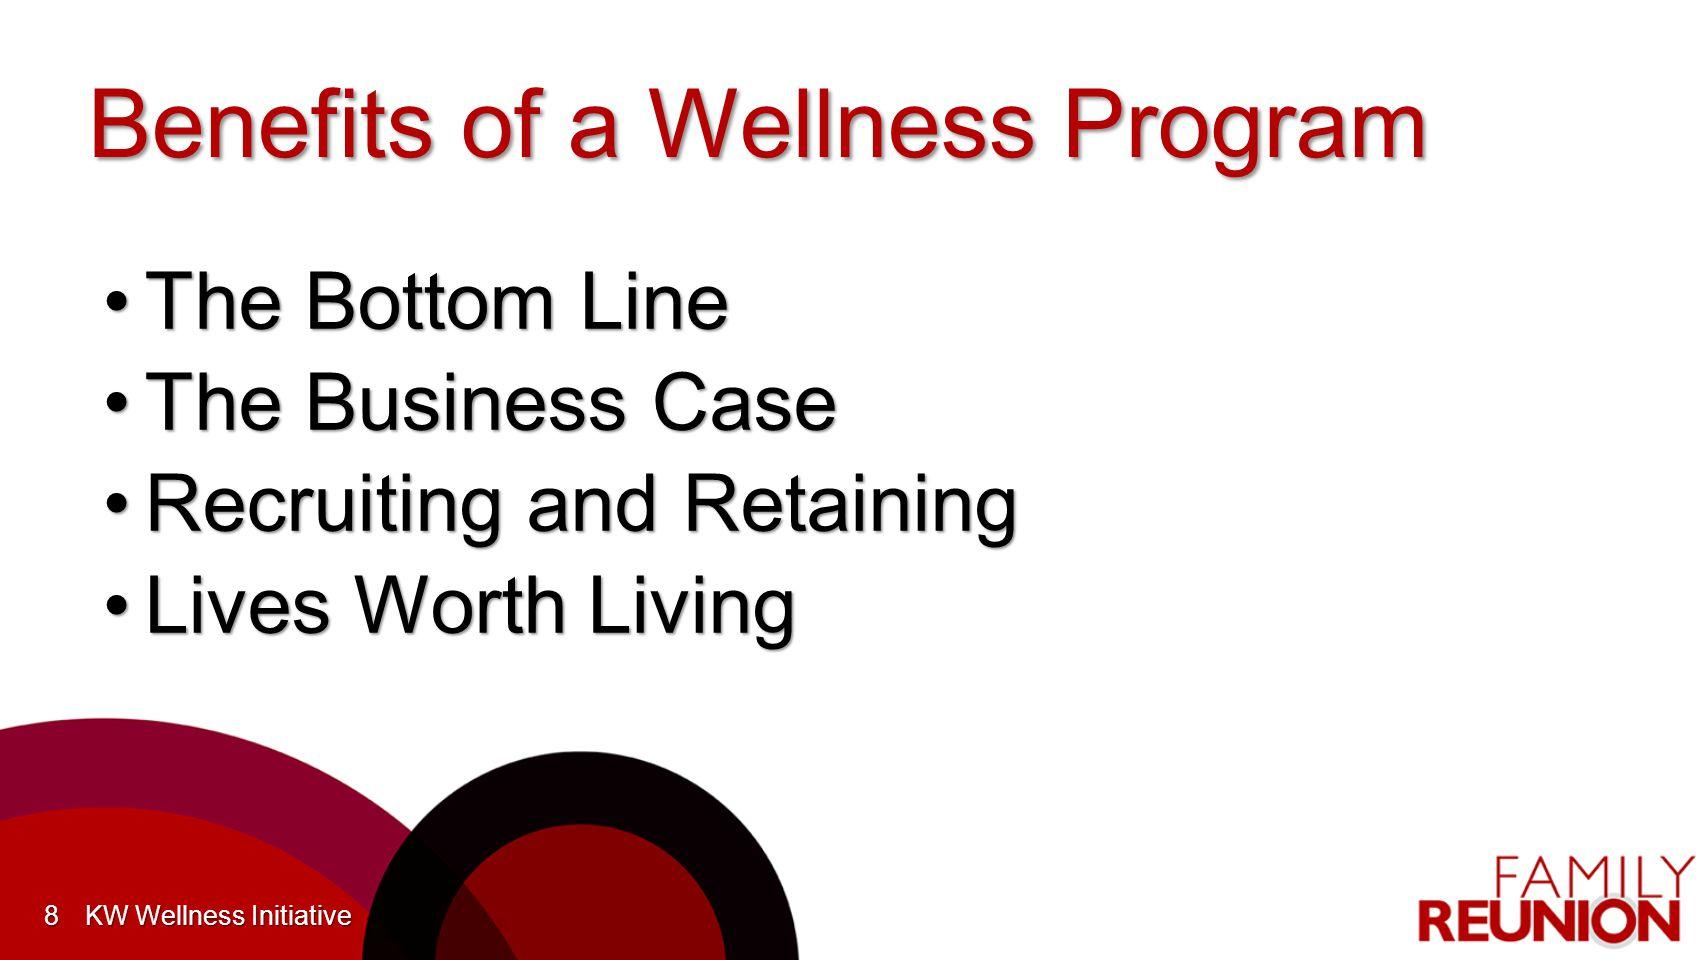 The Bottom Line $1 Spent on Wellness = $5.81 Company Gain 9KW Wellness Initiative